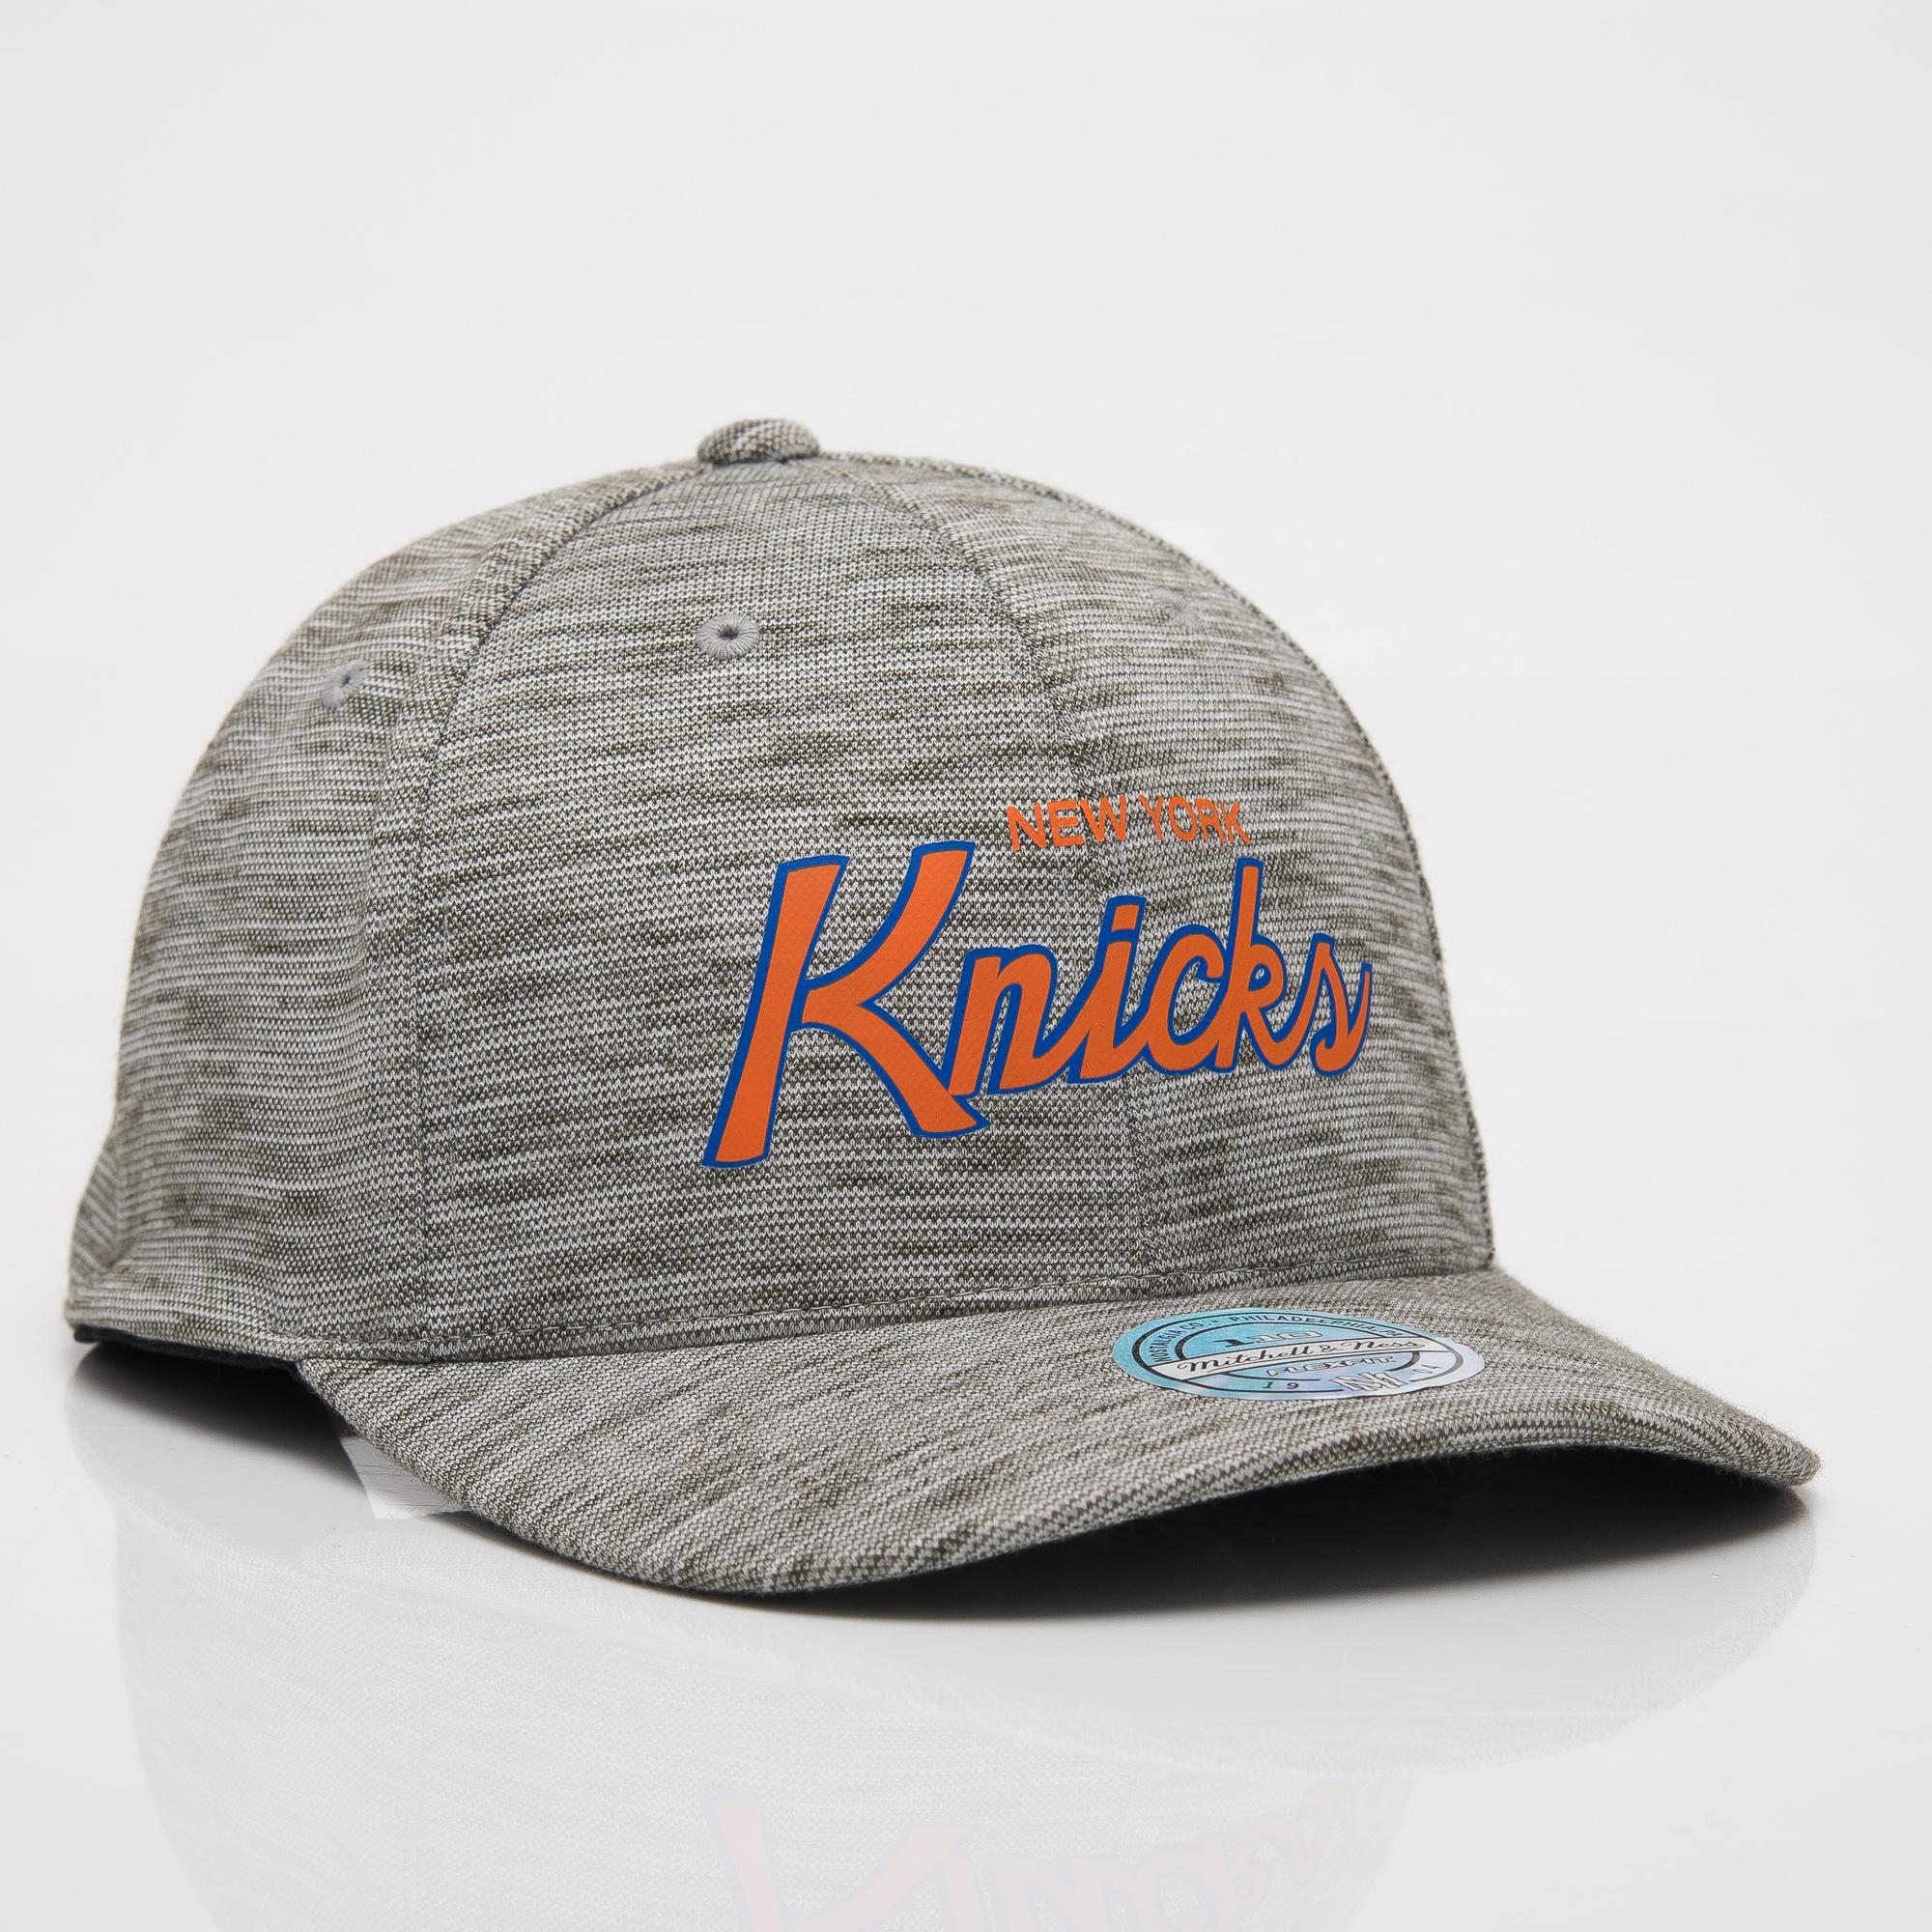 8741dd7cb0d Mitchell   Ness NBA New York Knicks Slub Print 110 Snapback Cap - NBA Shop  New York Knicks Merchandise - Superfanas.lt